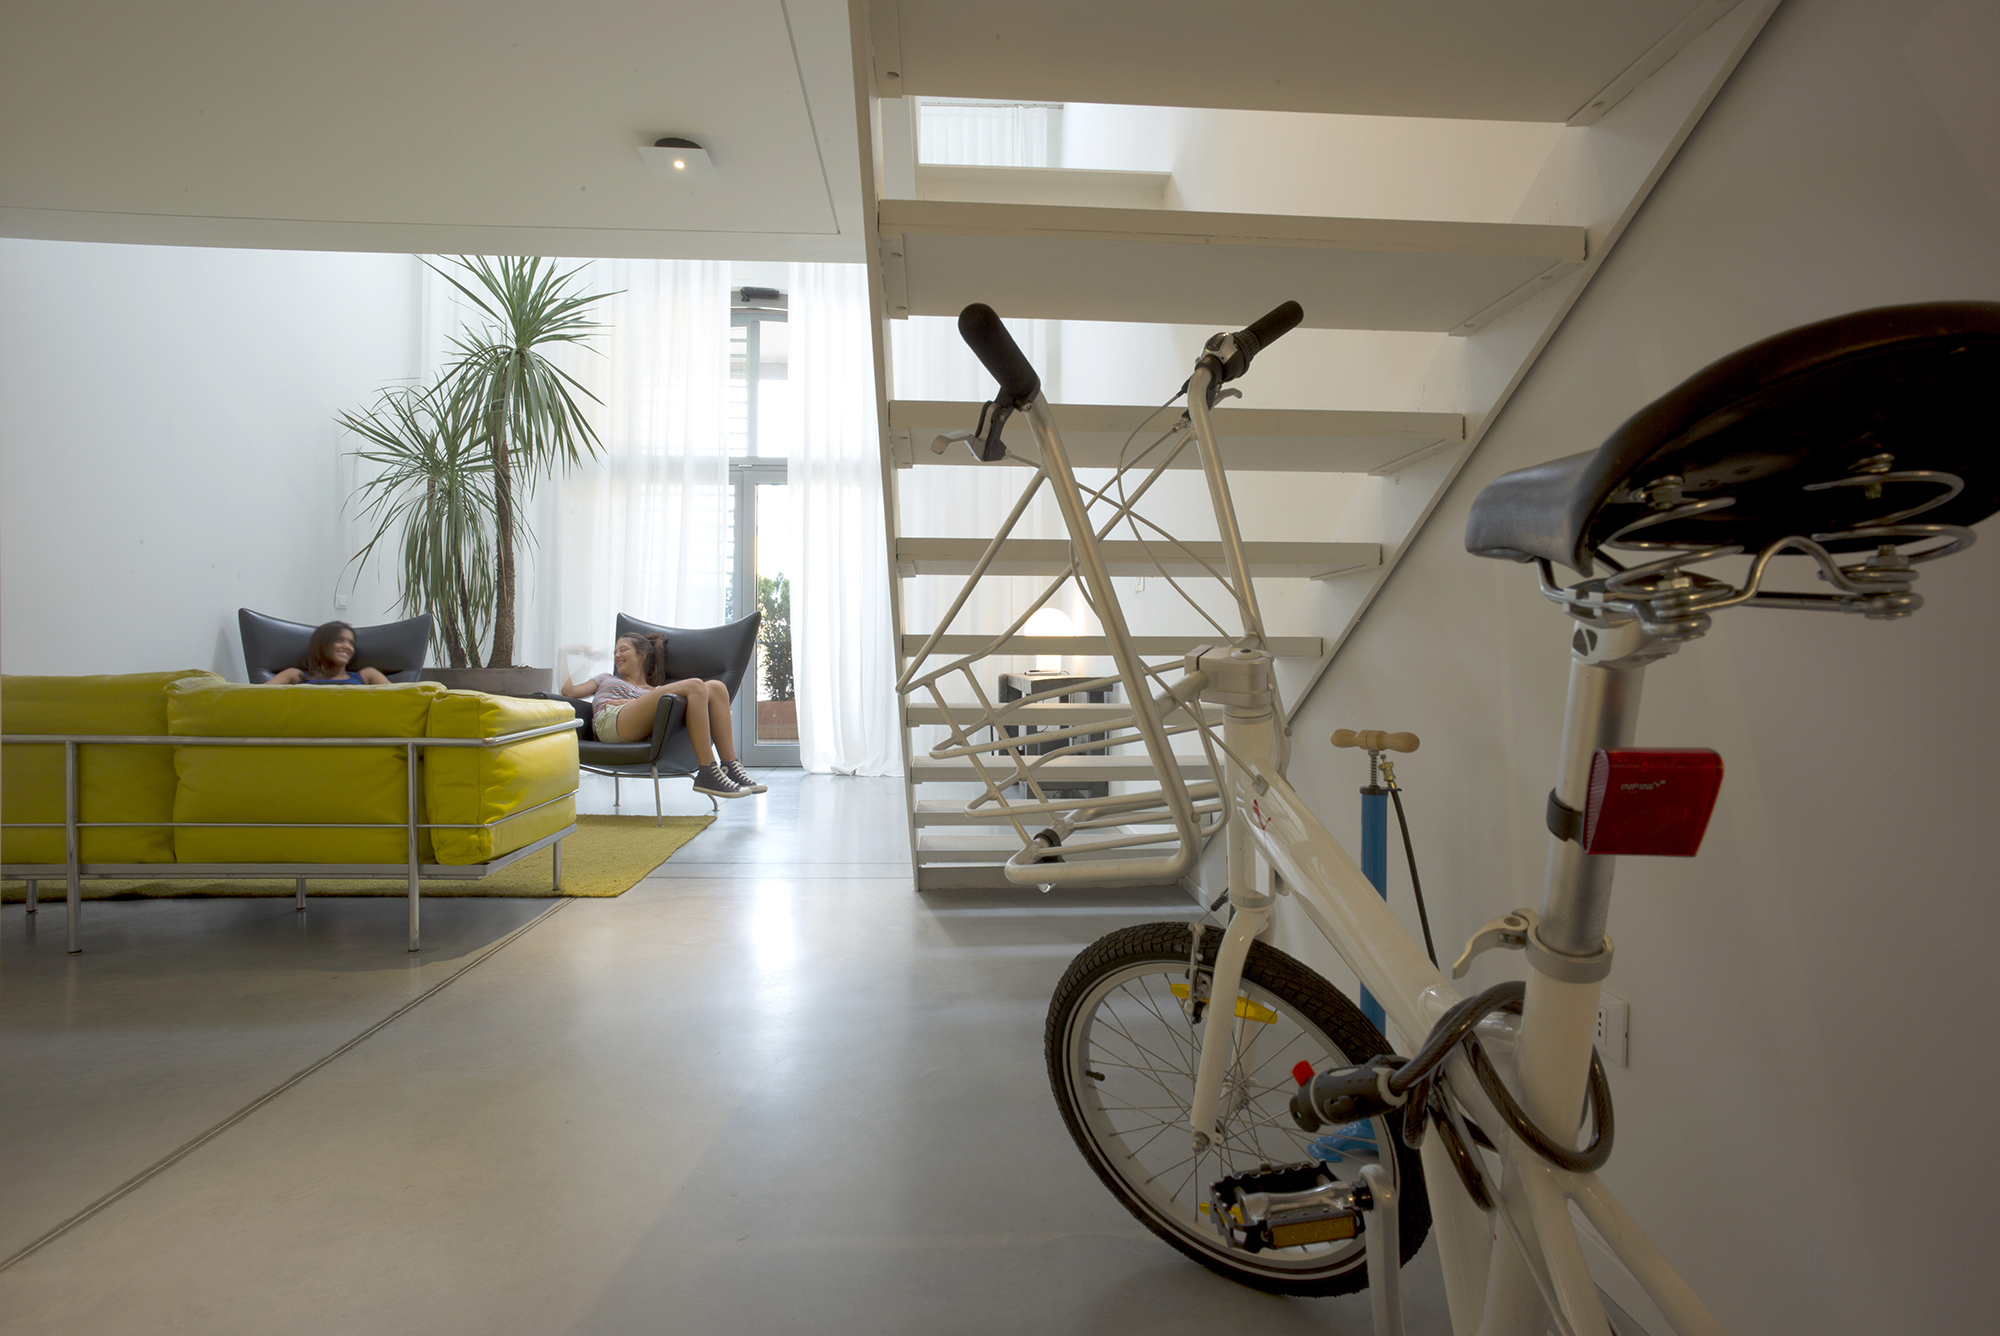 ex-warehouse-lofts-03.jpg